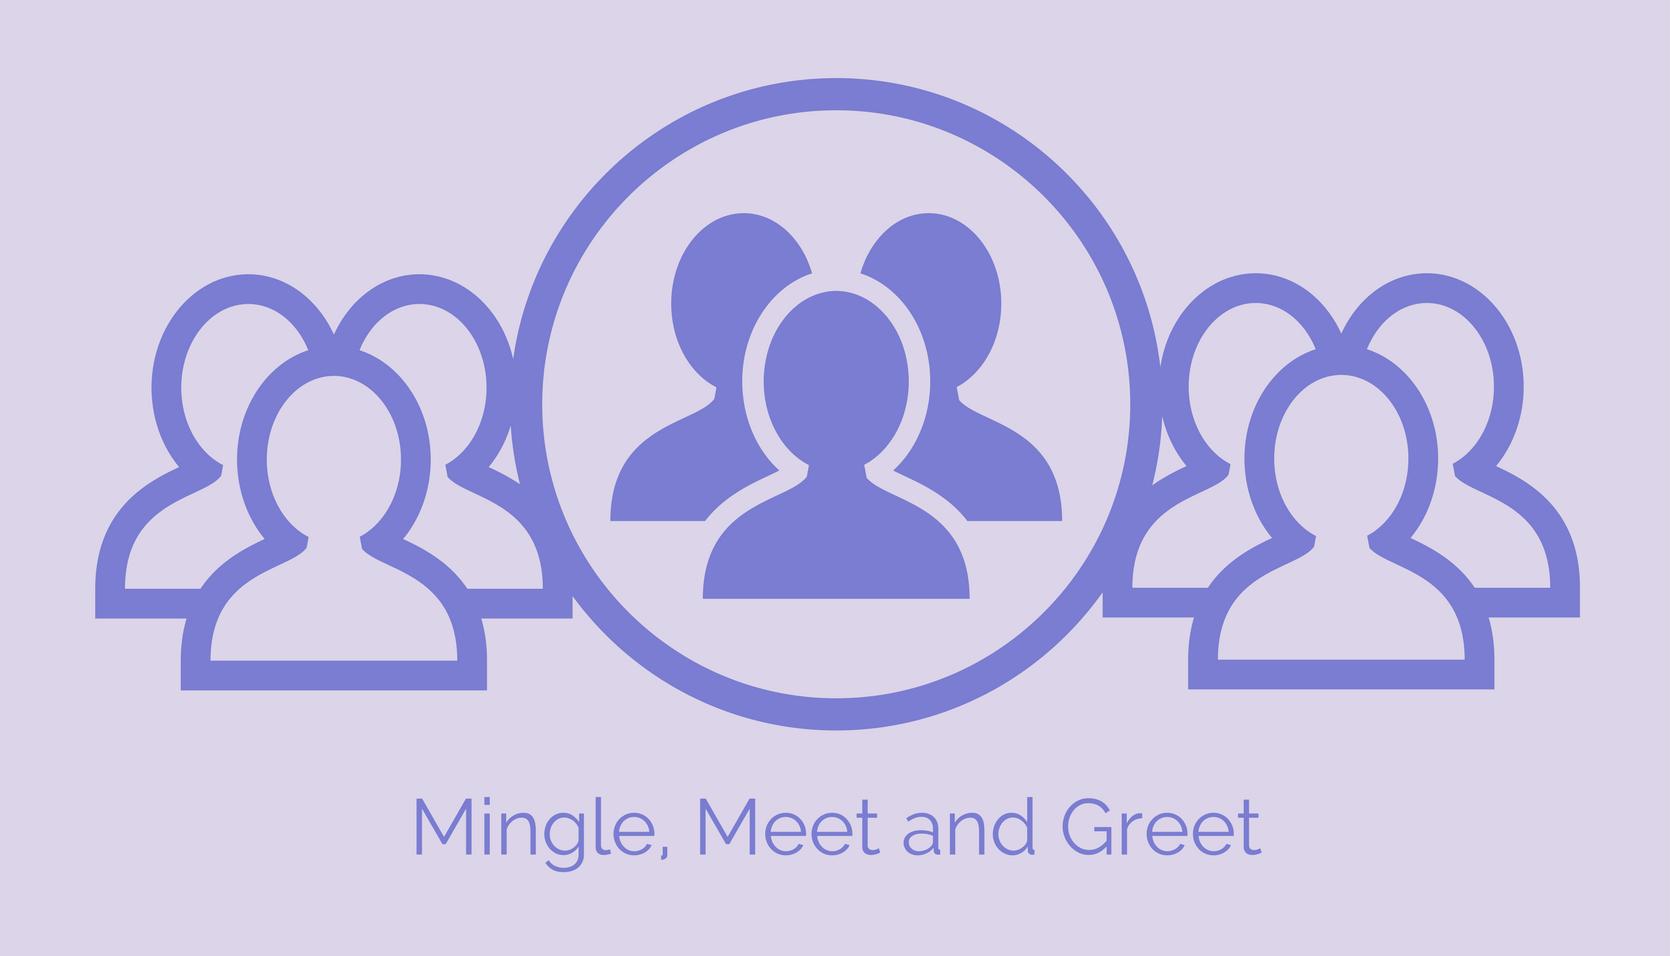 Mingle, Meet and Greet